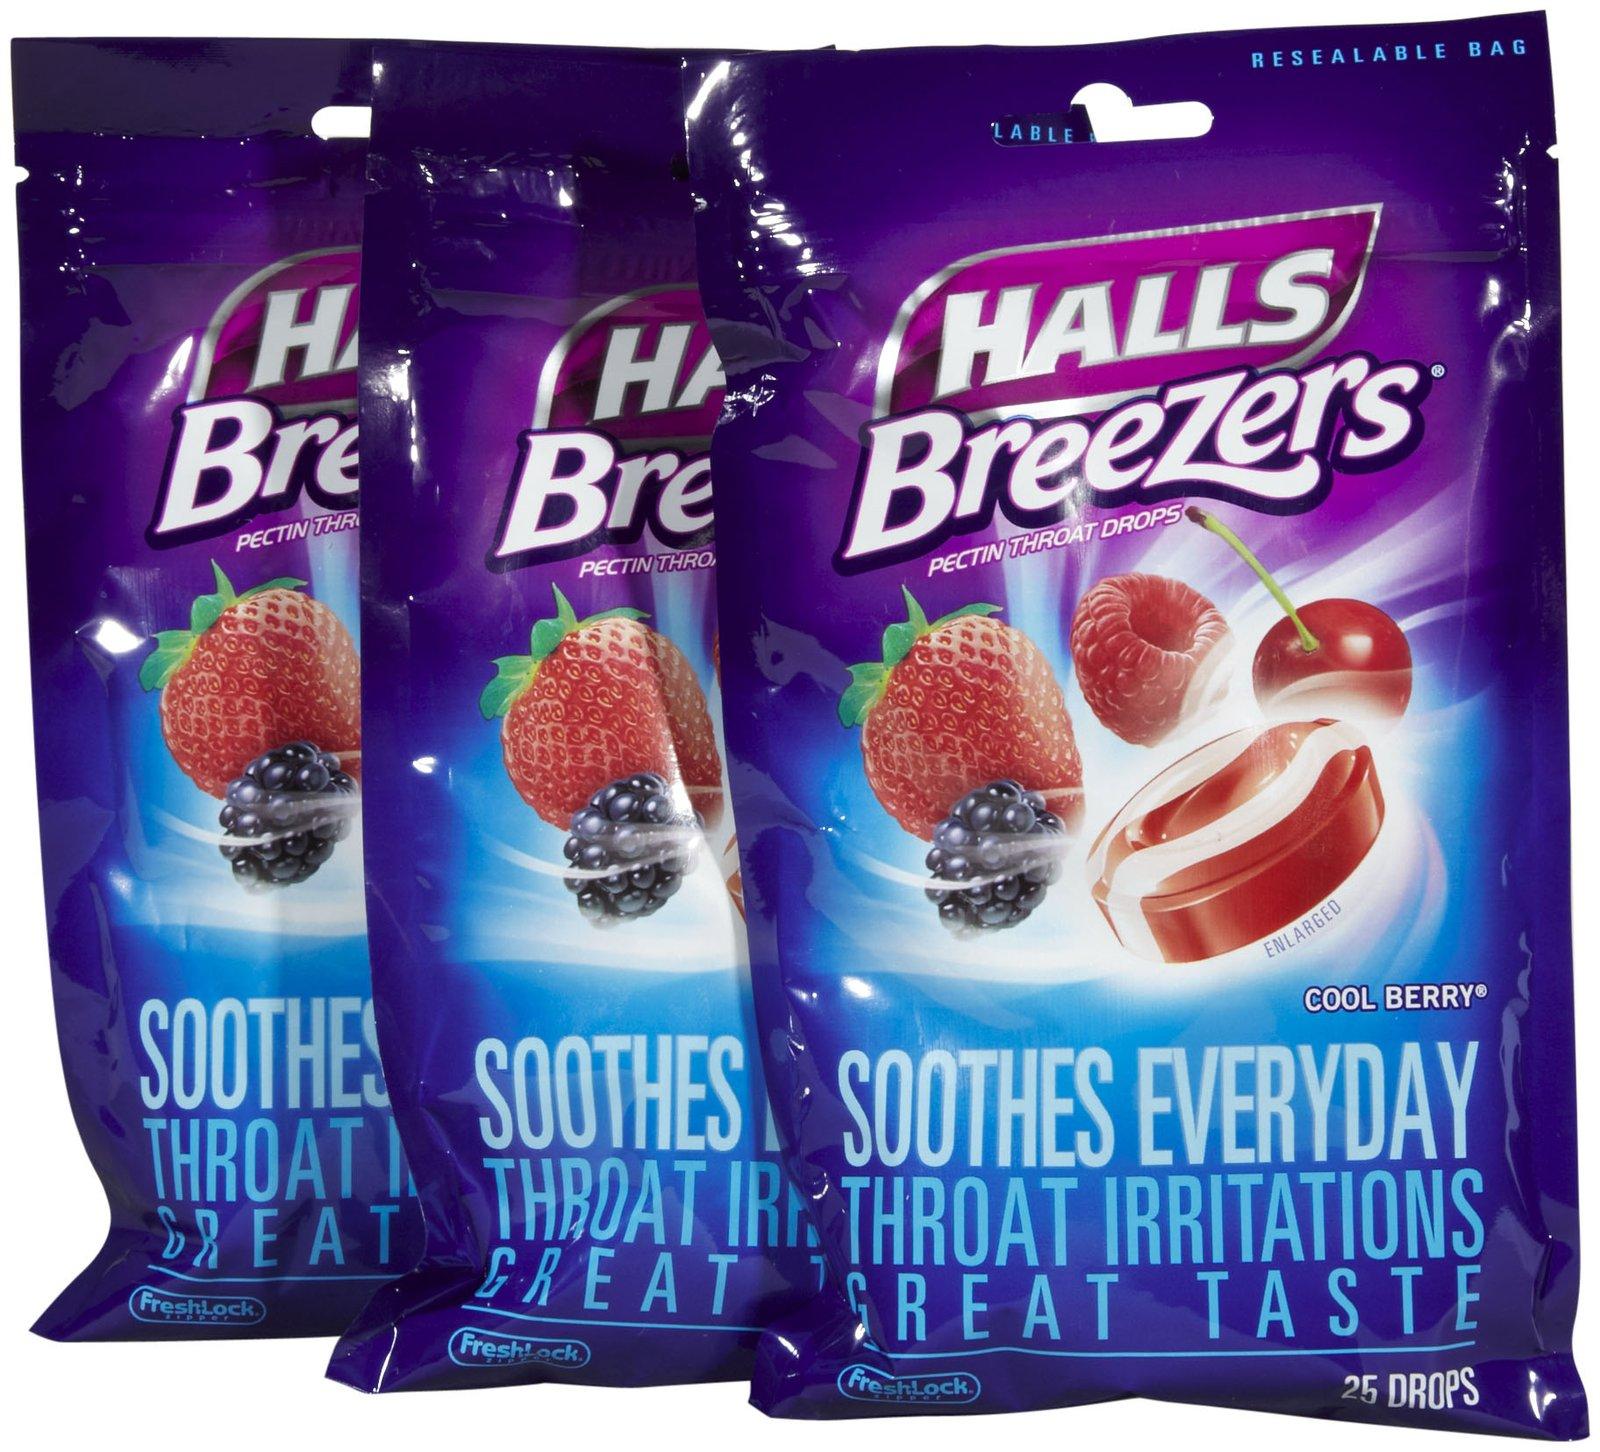 Save 50¢ on any ONE (1) Single Bag of HALLS Drops